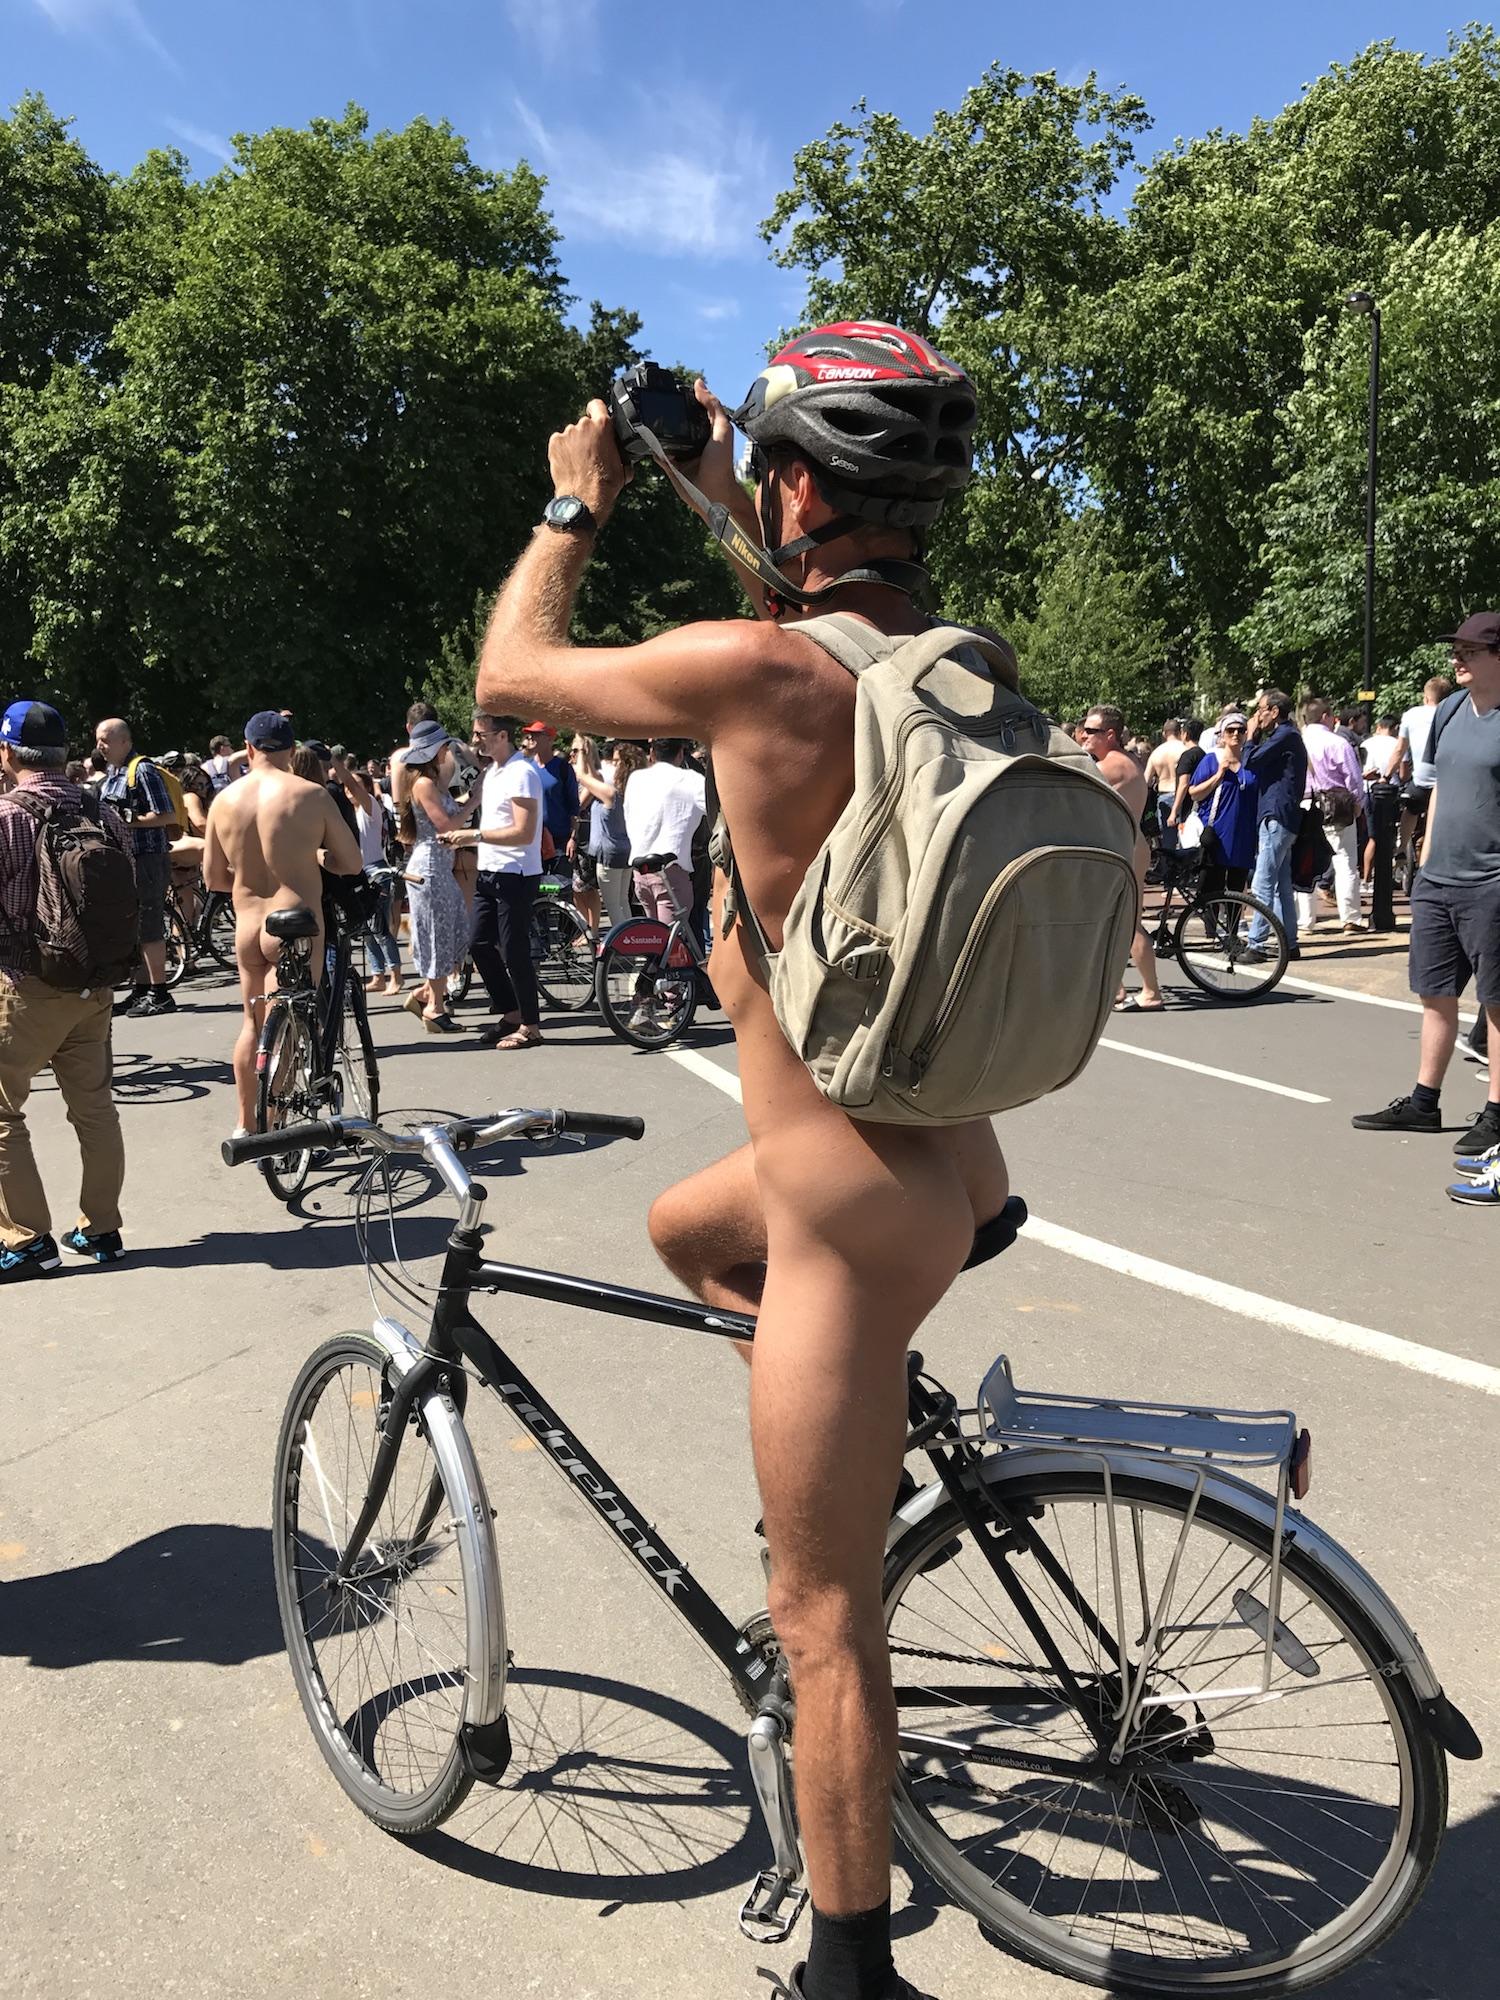 Naked Bike Rider Taking Photos. World's Naked Bike Ride London 2017